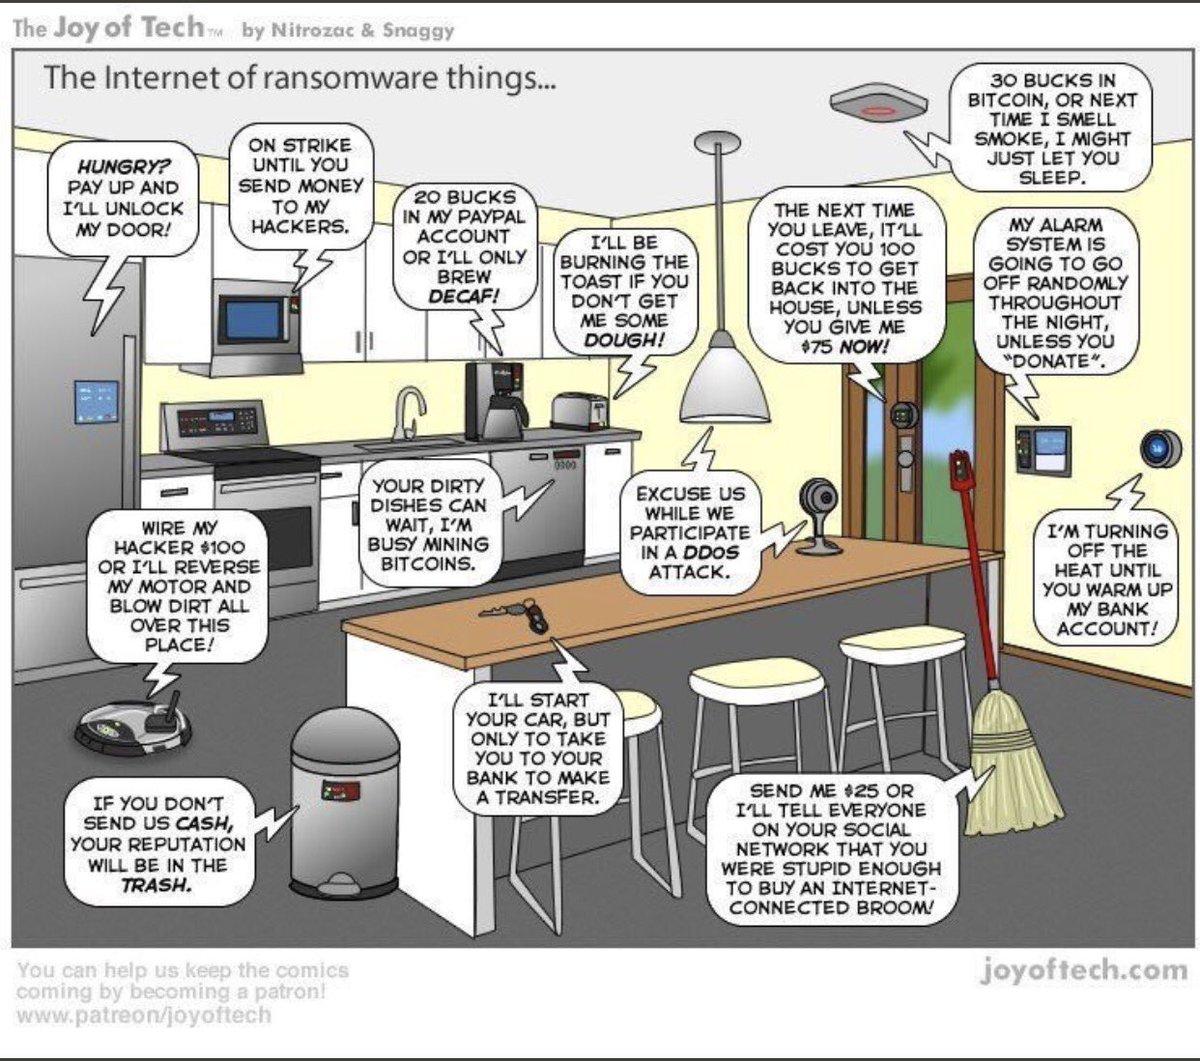 Internet of #ransomware. #Blockchain #cloud  #bitcoin #IoT #tech #vr  #bigdata #fintech #cybersecurity #databreach #SmartCity #btc $btc<br>http://pic.twitter.com/ycMzCm4duP